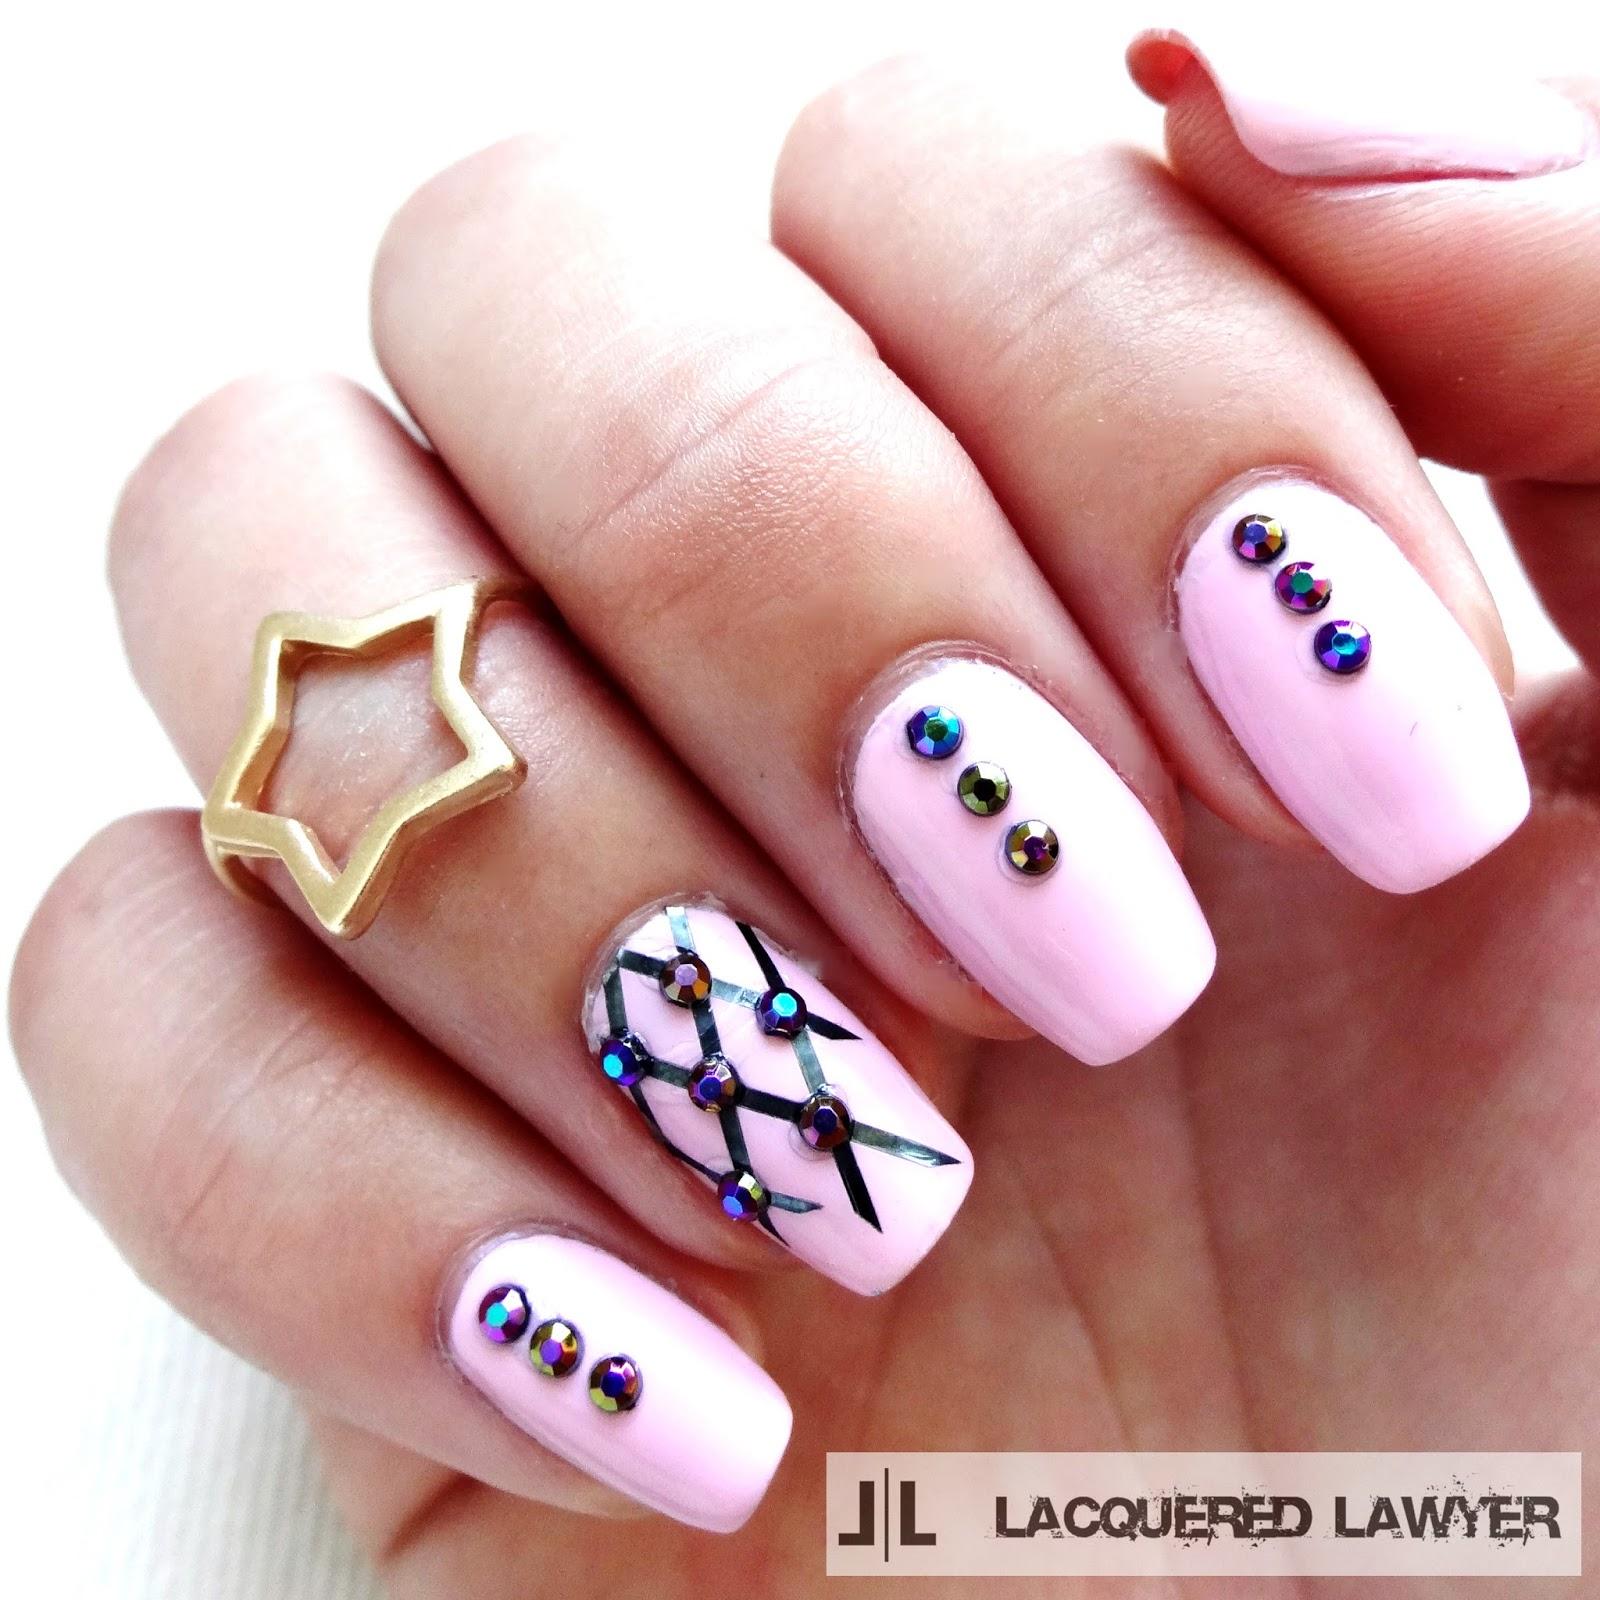 Lacquered Lawyer | Nail Art Blog: Nail Tape